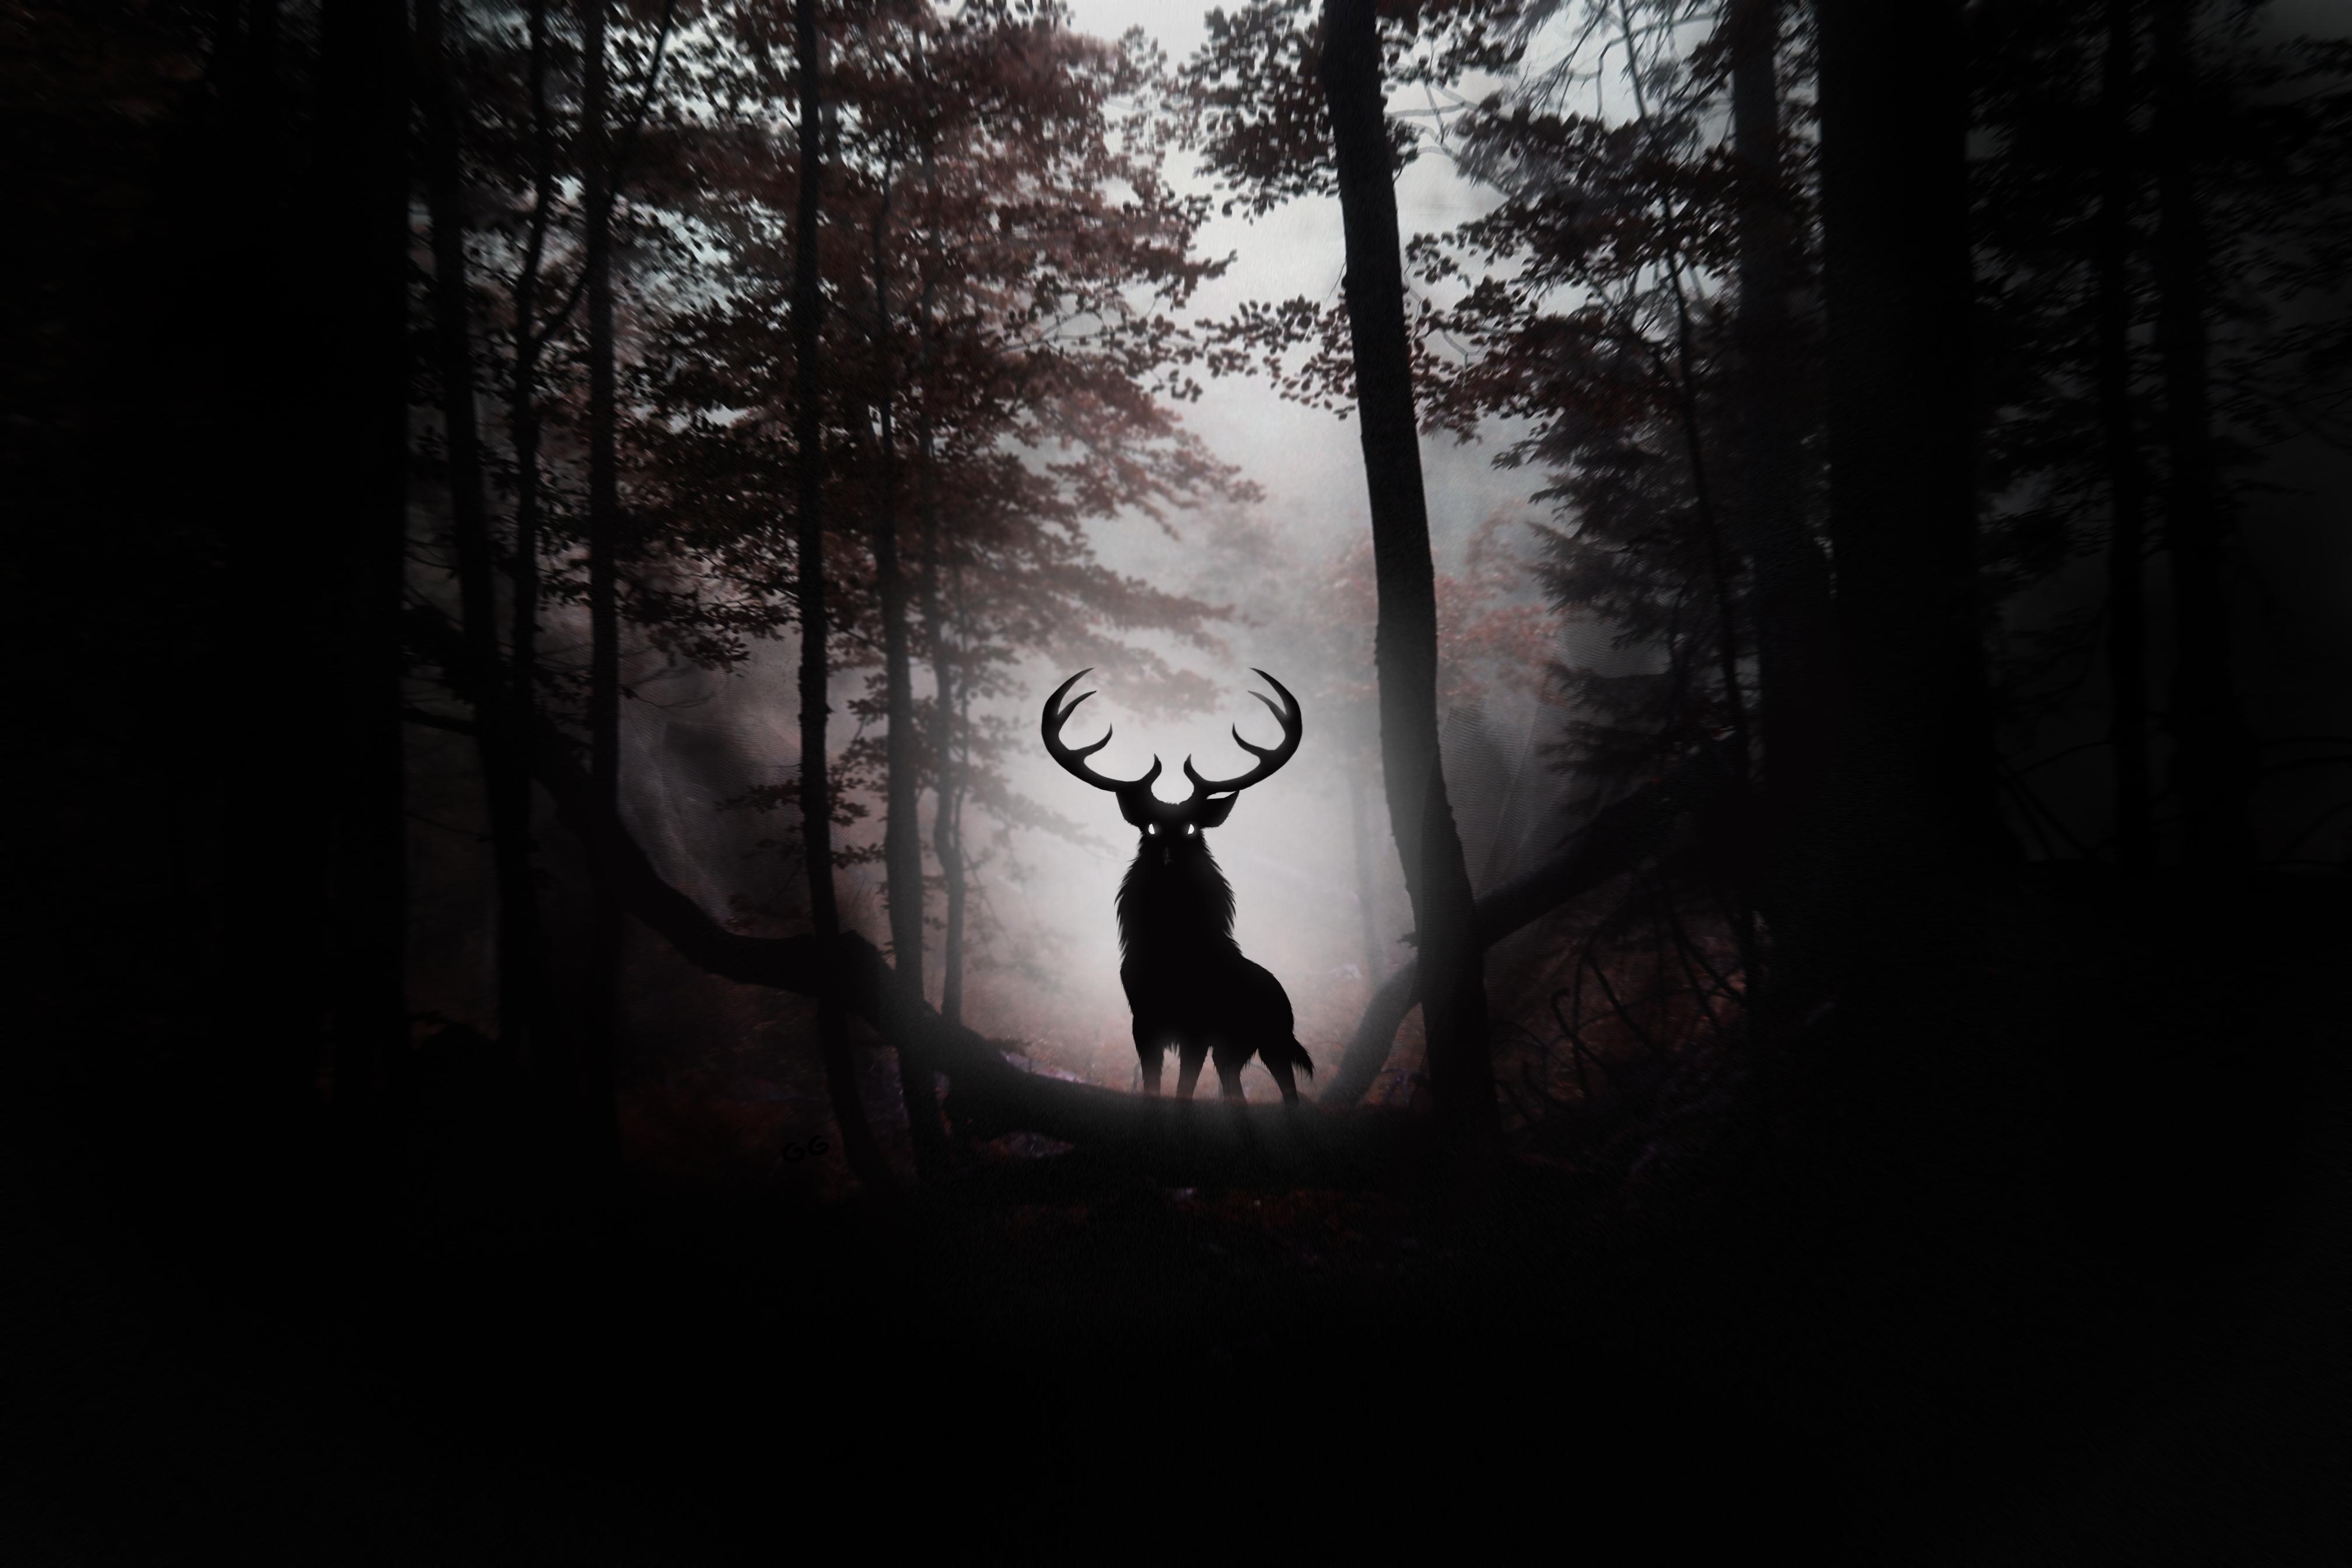 Misty Deer 4k Hd Desktop Wallpaper For 4k Ultra Hd Tv: Deer Fantasy Artwork 4k, HD Artist, 4k Wallpapers, Images